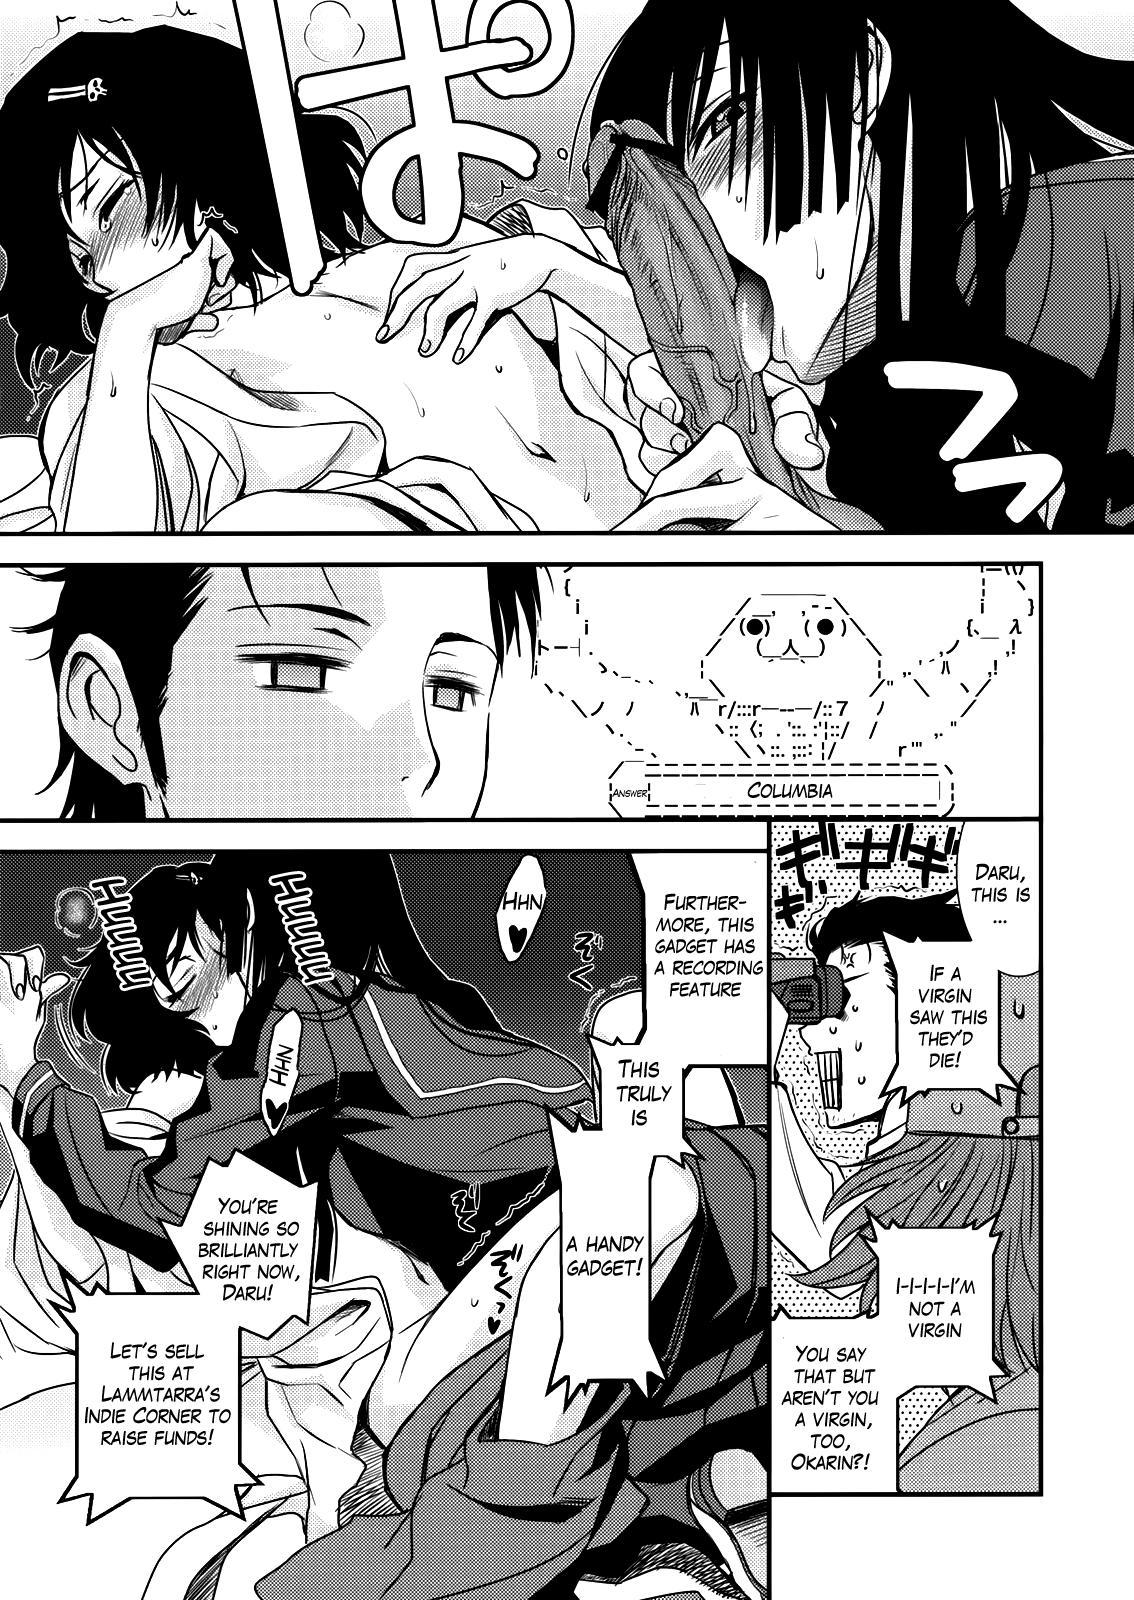 Hontou ni Atta Kowai Hanashi   It Really Was There! A Scary Story 16